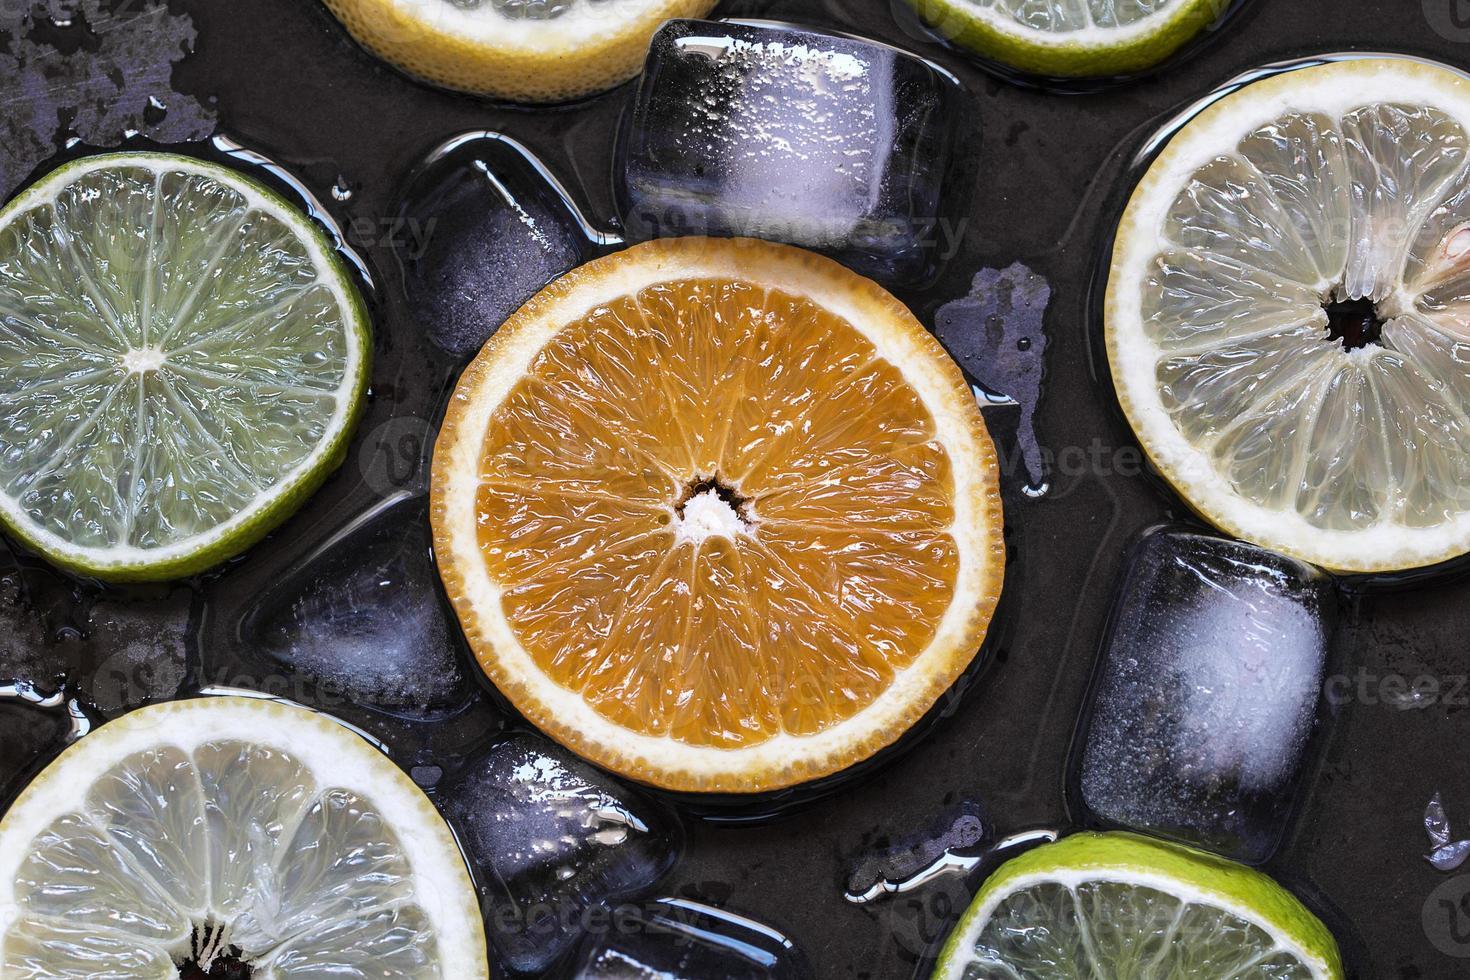 rodajas de cítricos limón, lima, naranja, pomelo con hielo ov foto